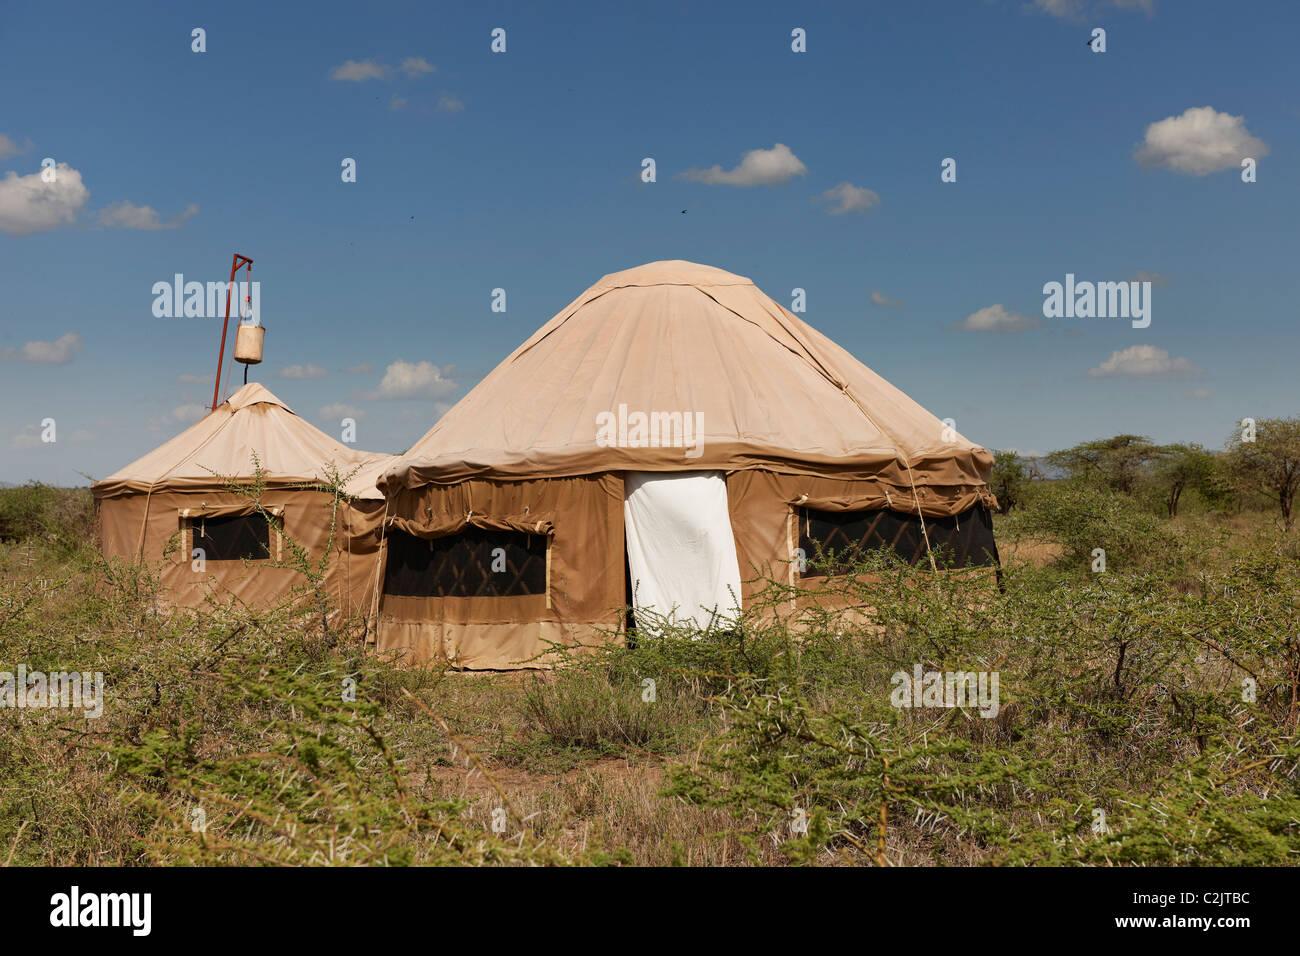 Carpas en estilo de yurta de Loliondo Nduara tendido Safari Camp, Serengeti, Tanzania, África Imagen De Stock